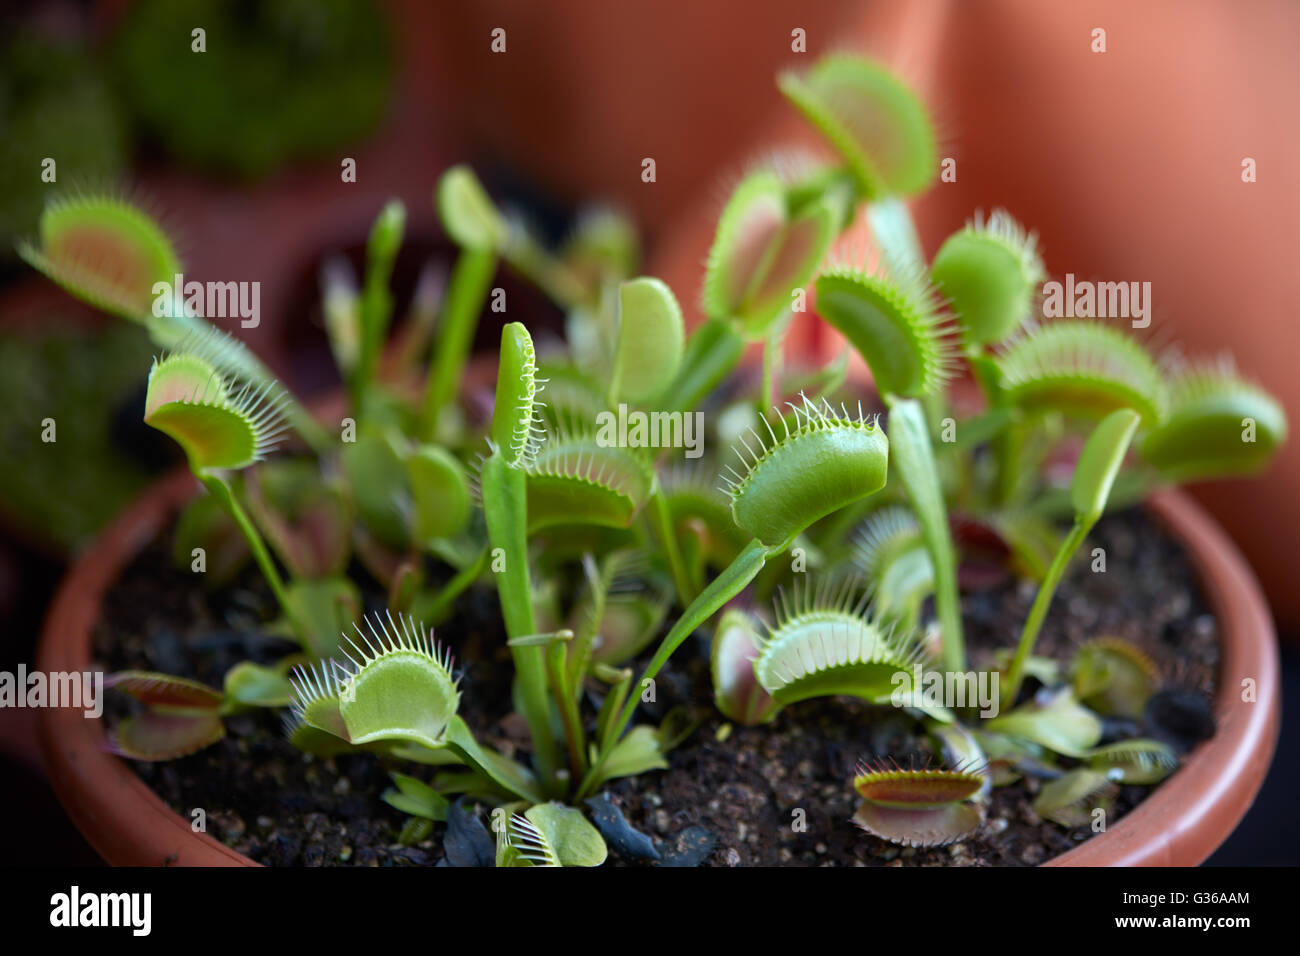 Venus flytrap, carnivorous plant dionaea in pot - Stock Image